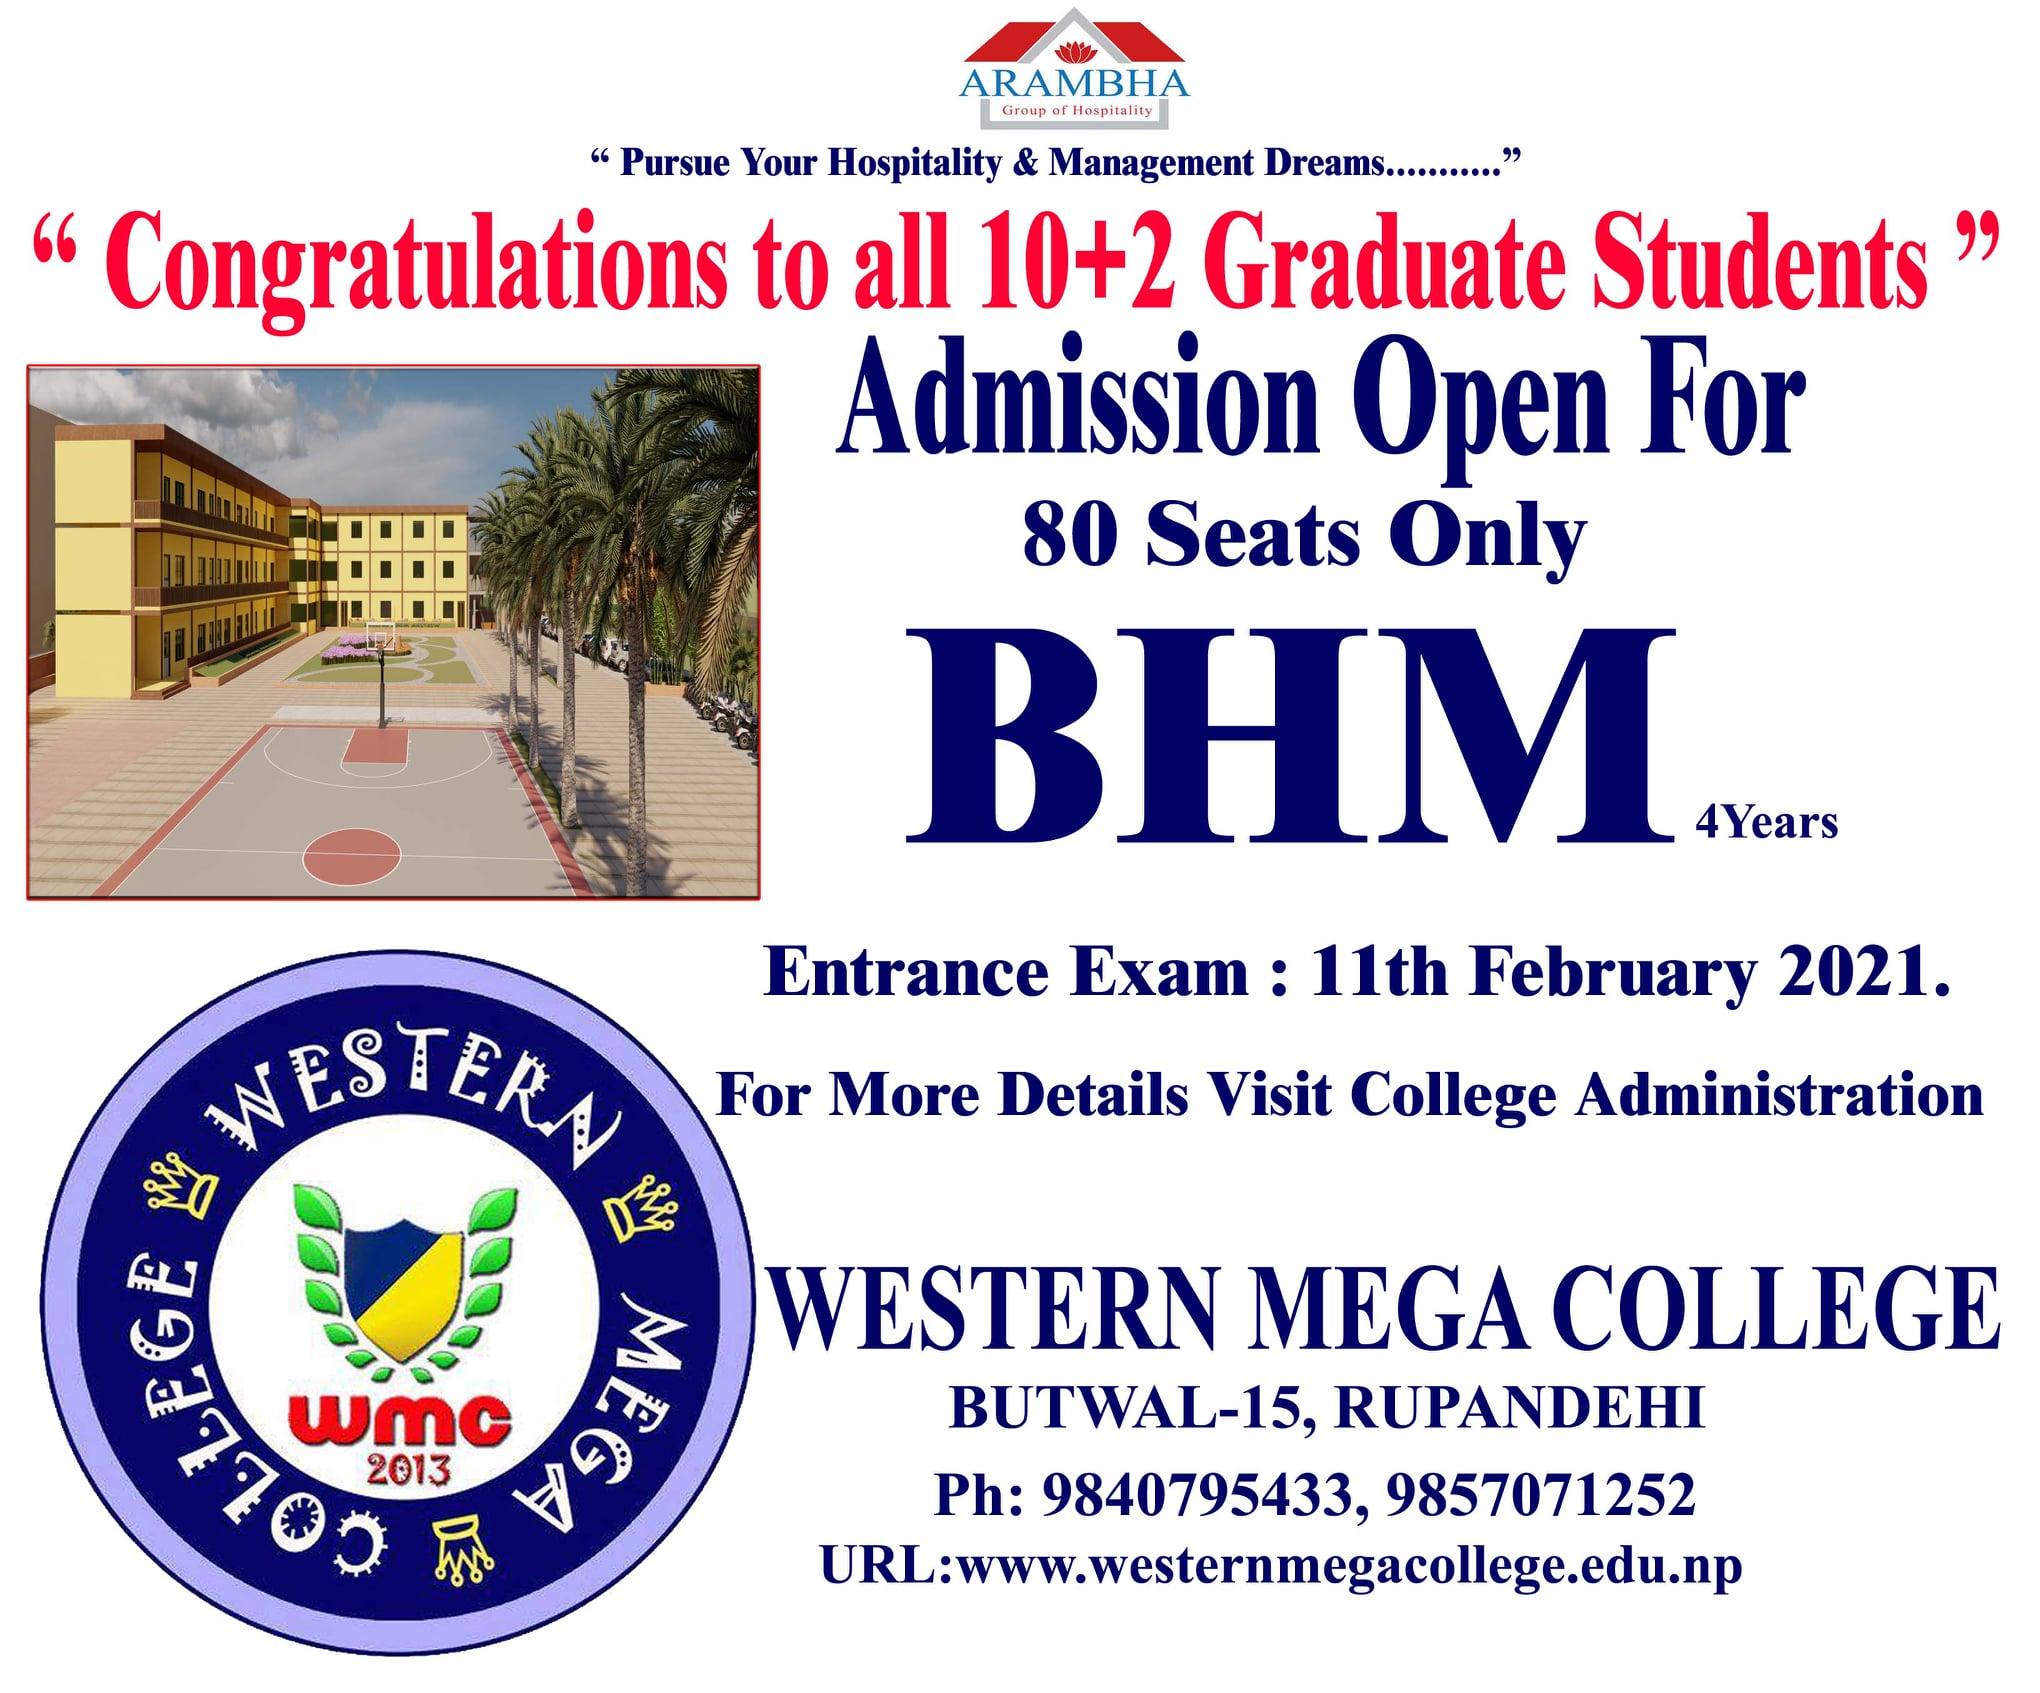 western mega college